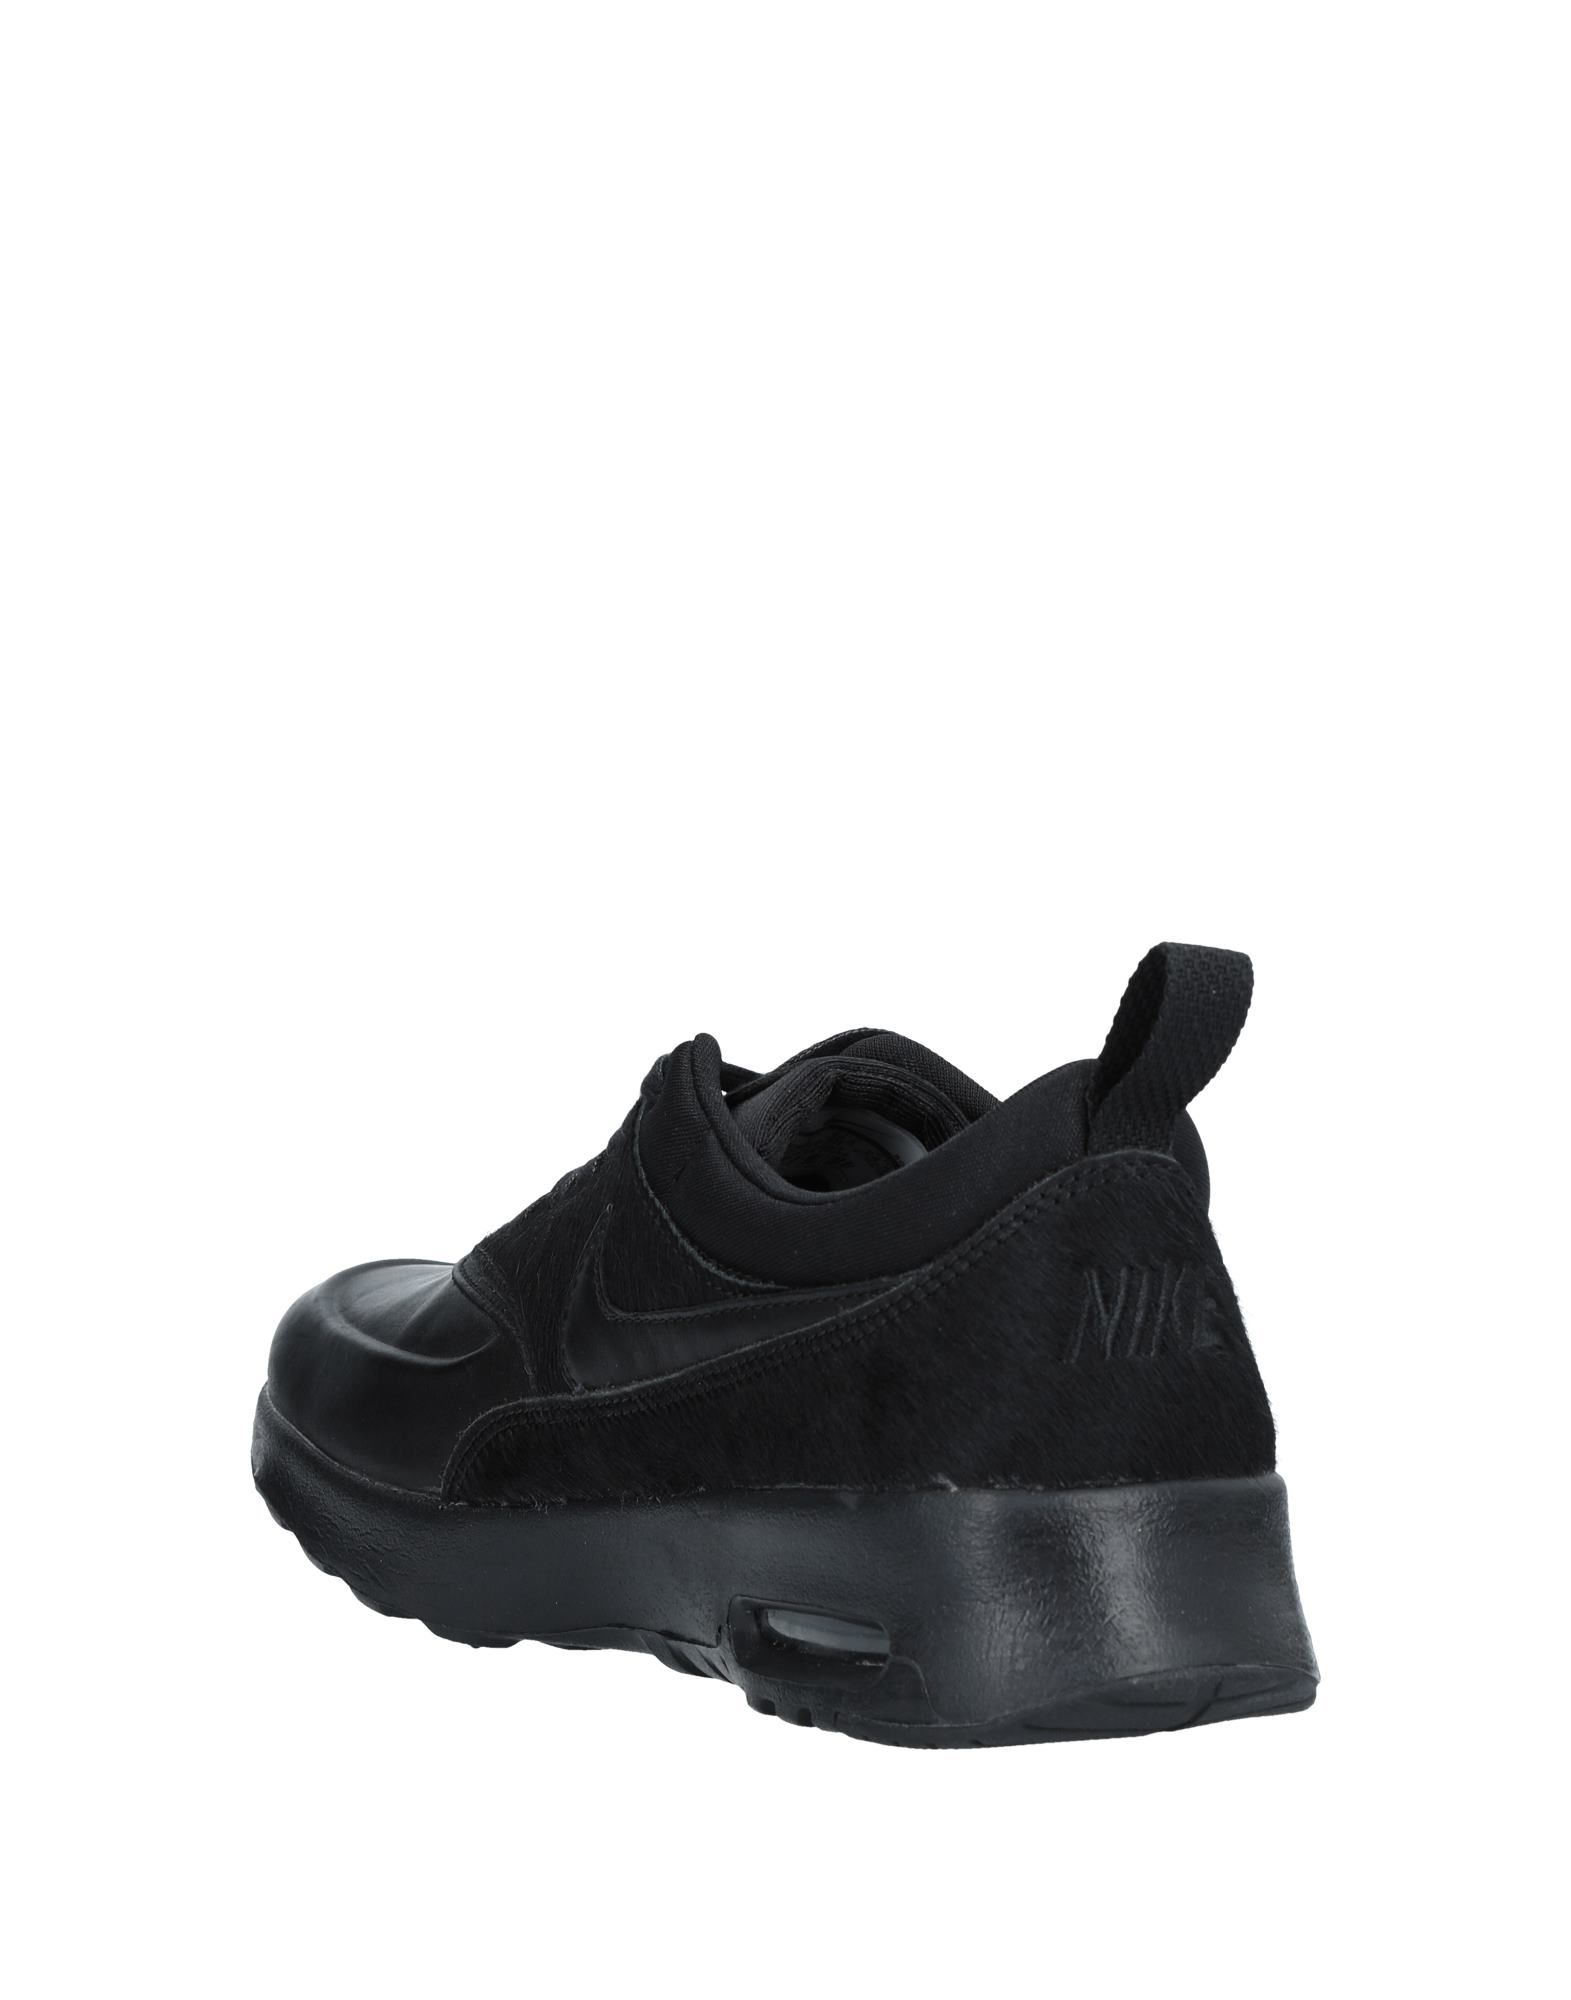 Nike sich Sneakers Damen Gutes Preis-Leistungs-Verhältnis, es lohnt sich Nike 2c9797